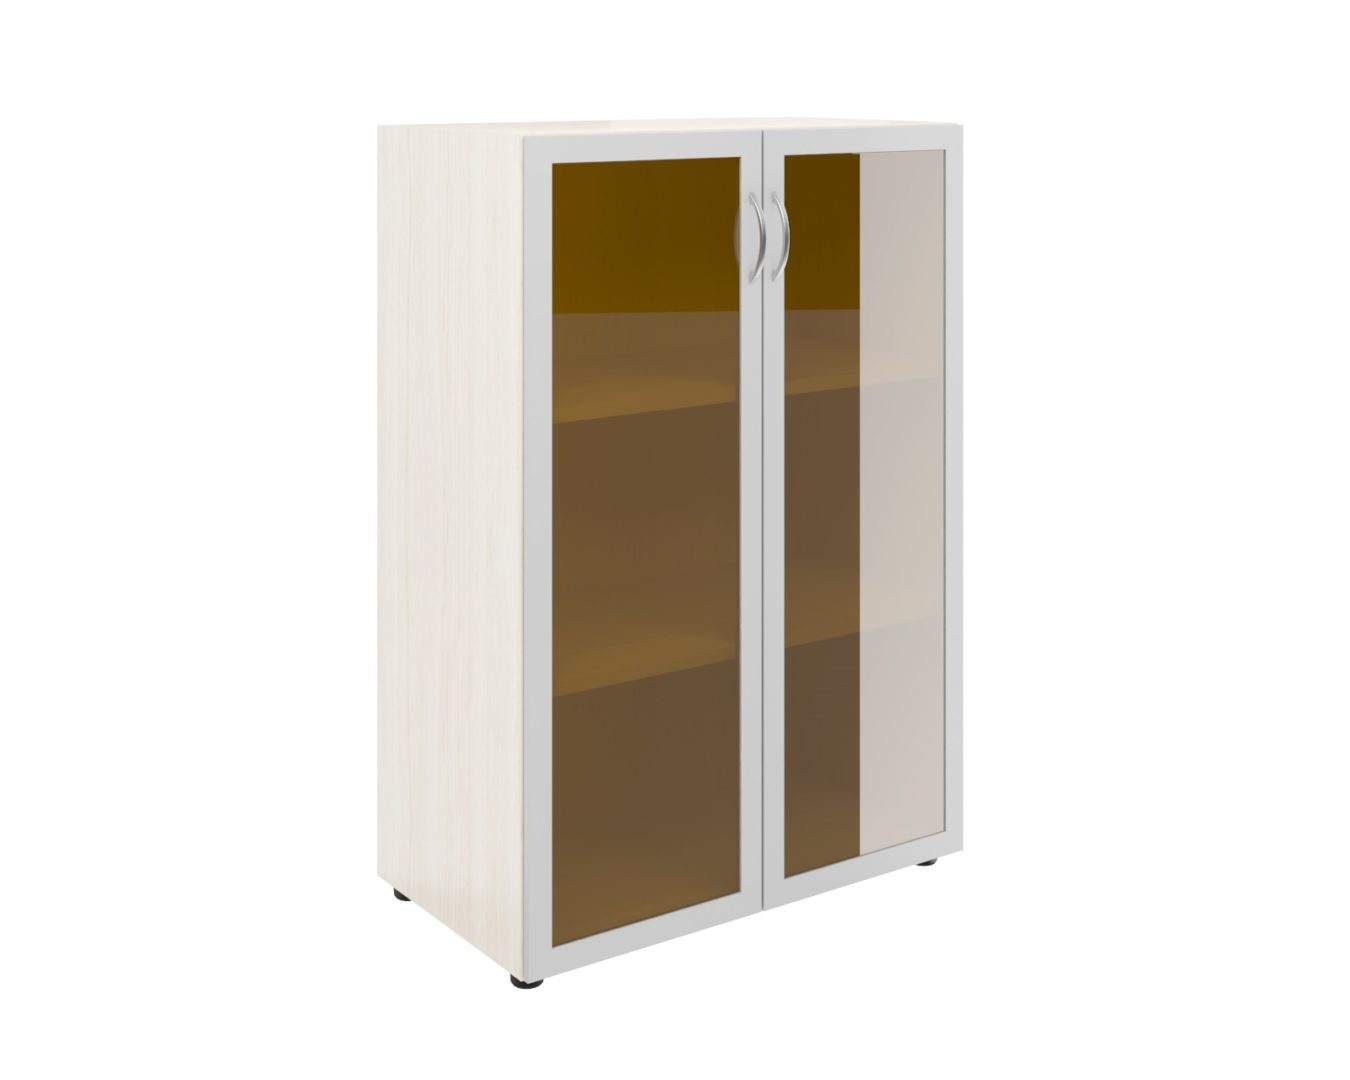 Шкаф широкий средний со стеклом в алюм. раме (без топа)  ФР-5.0+60.0*2+С504*2